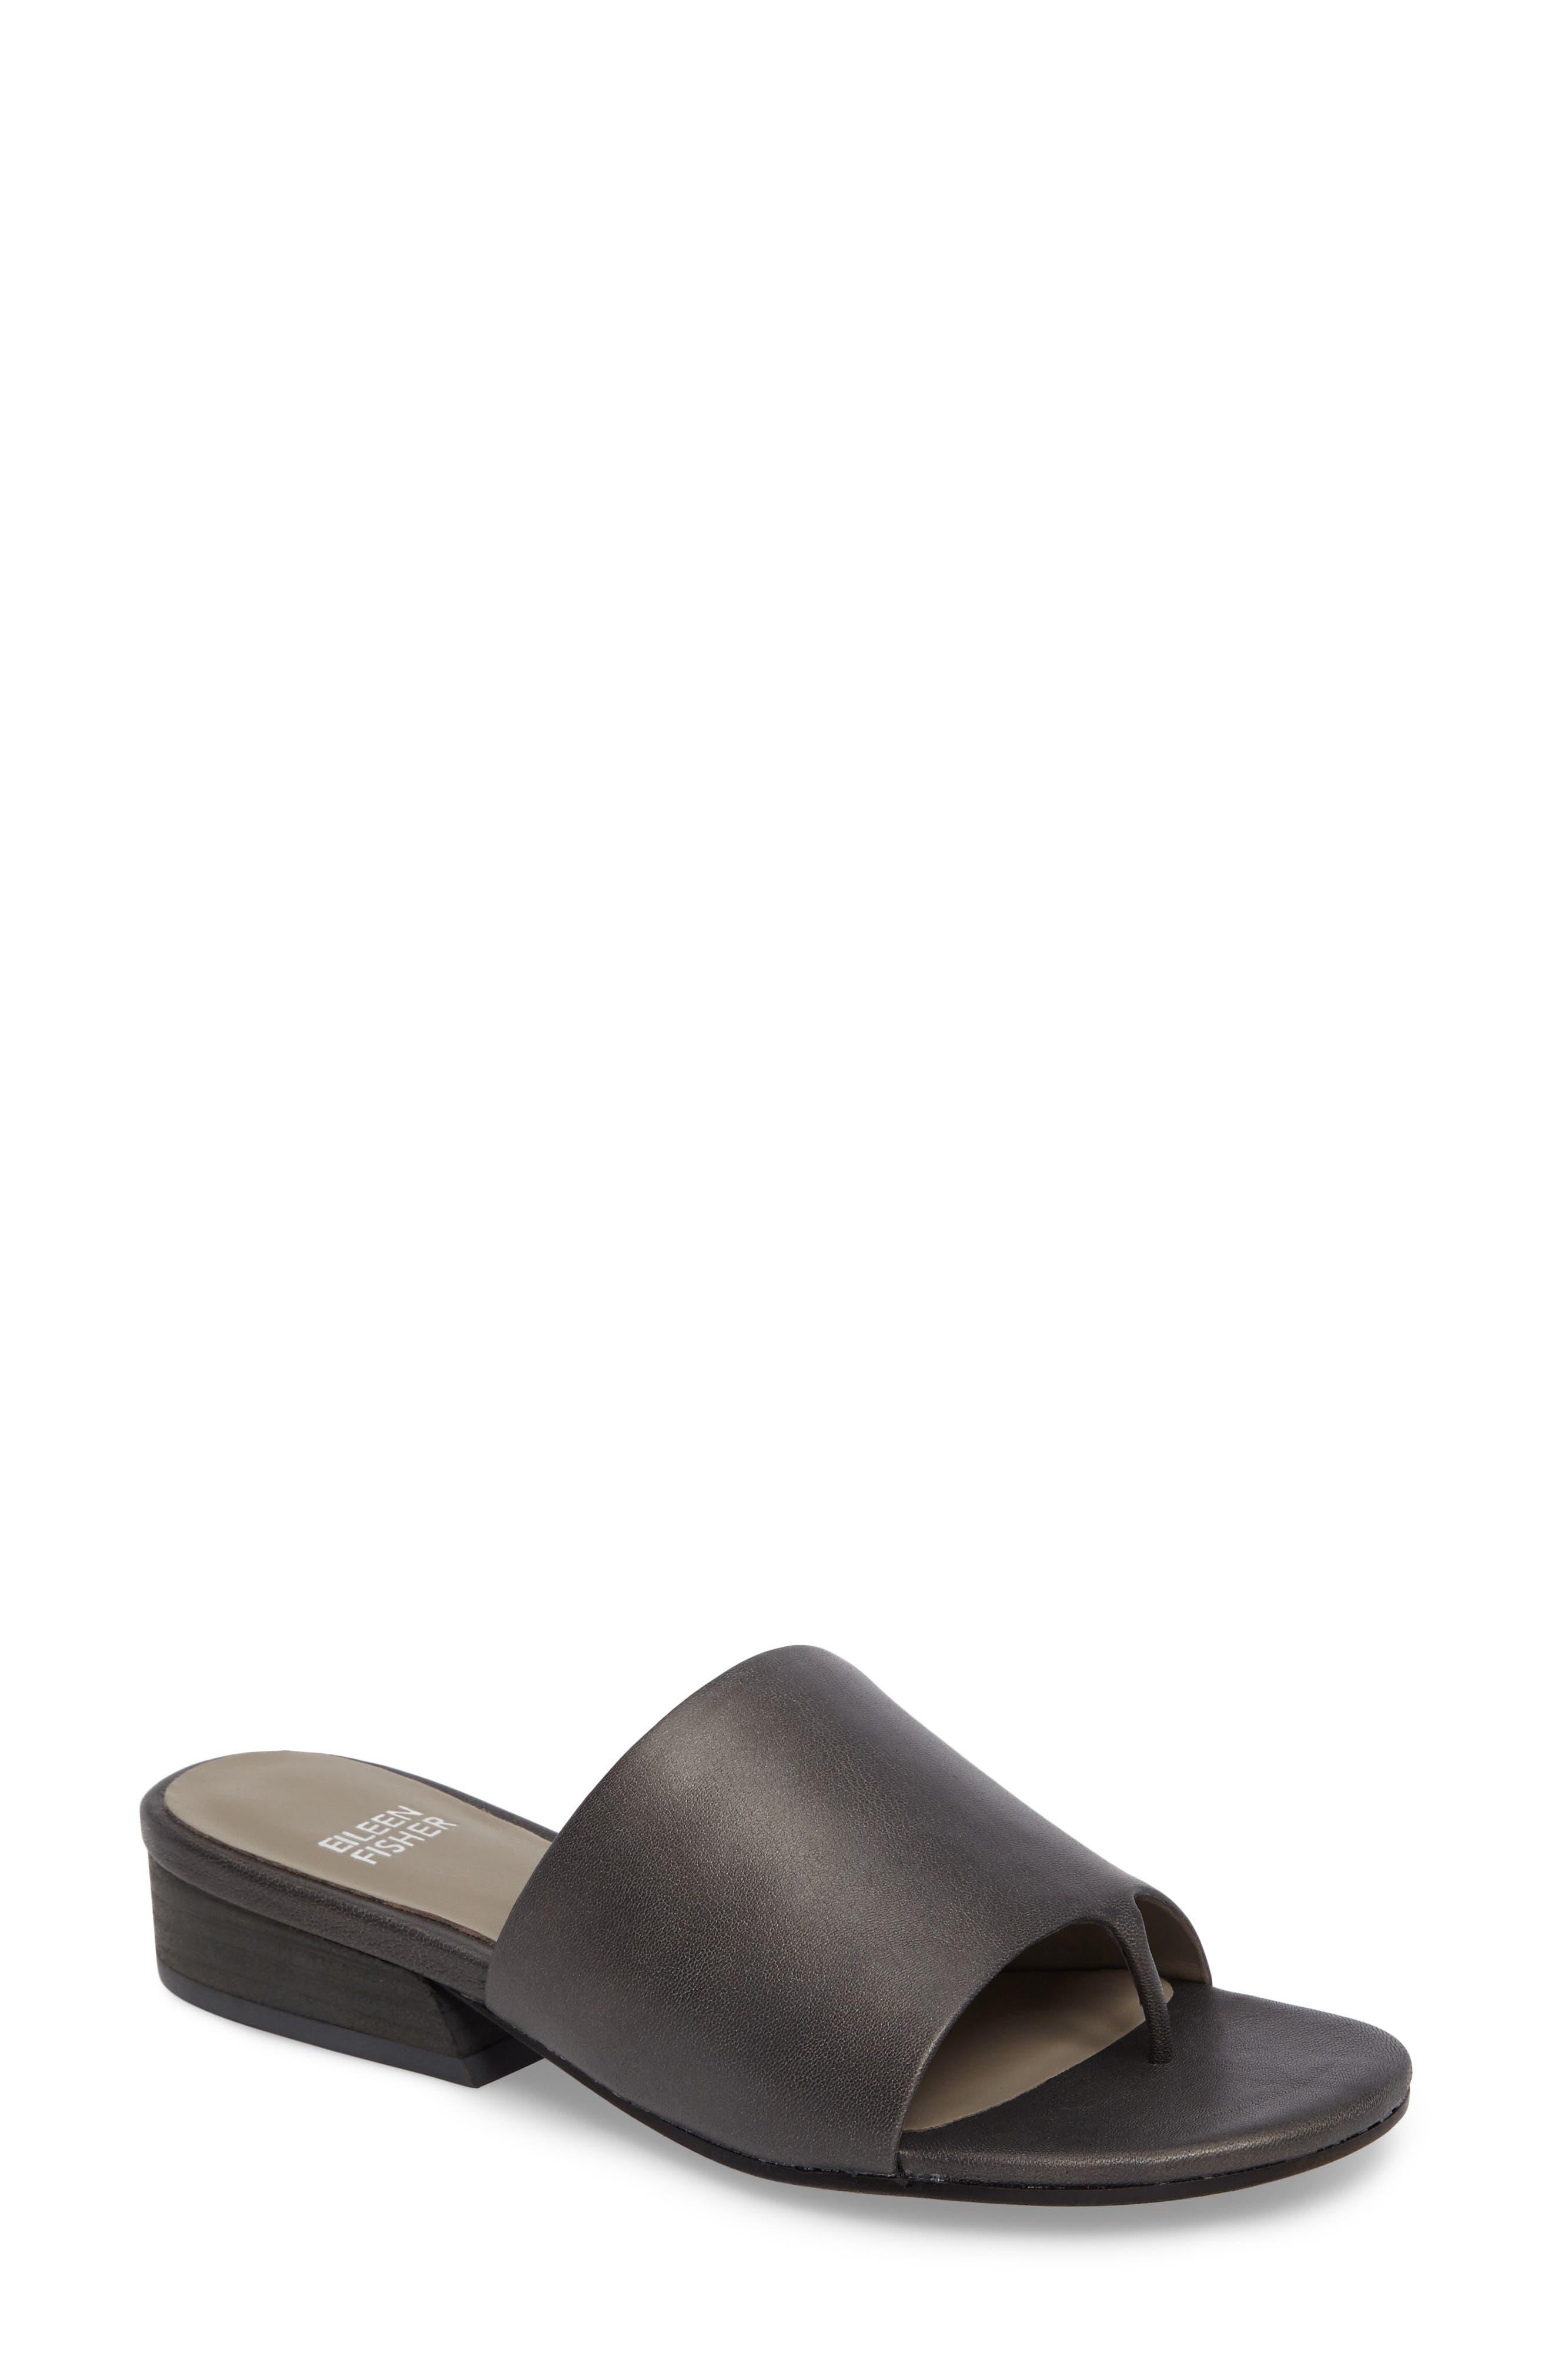 Beal Slide Sandal,                             Main thumbnail 1, color,                             050